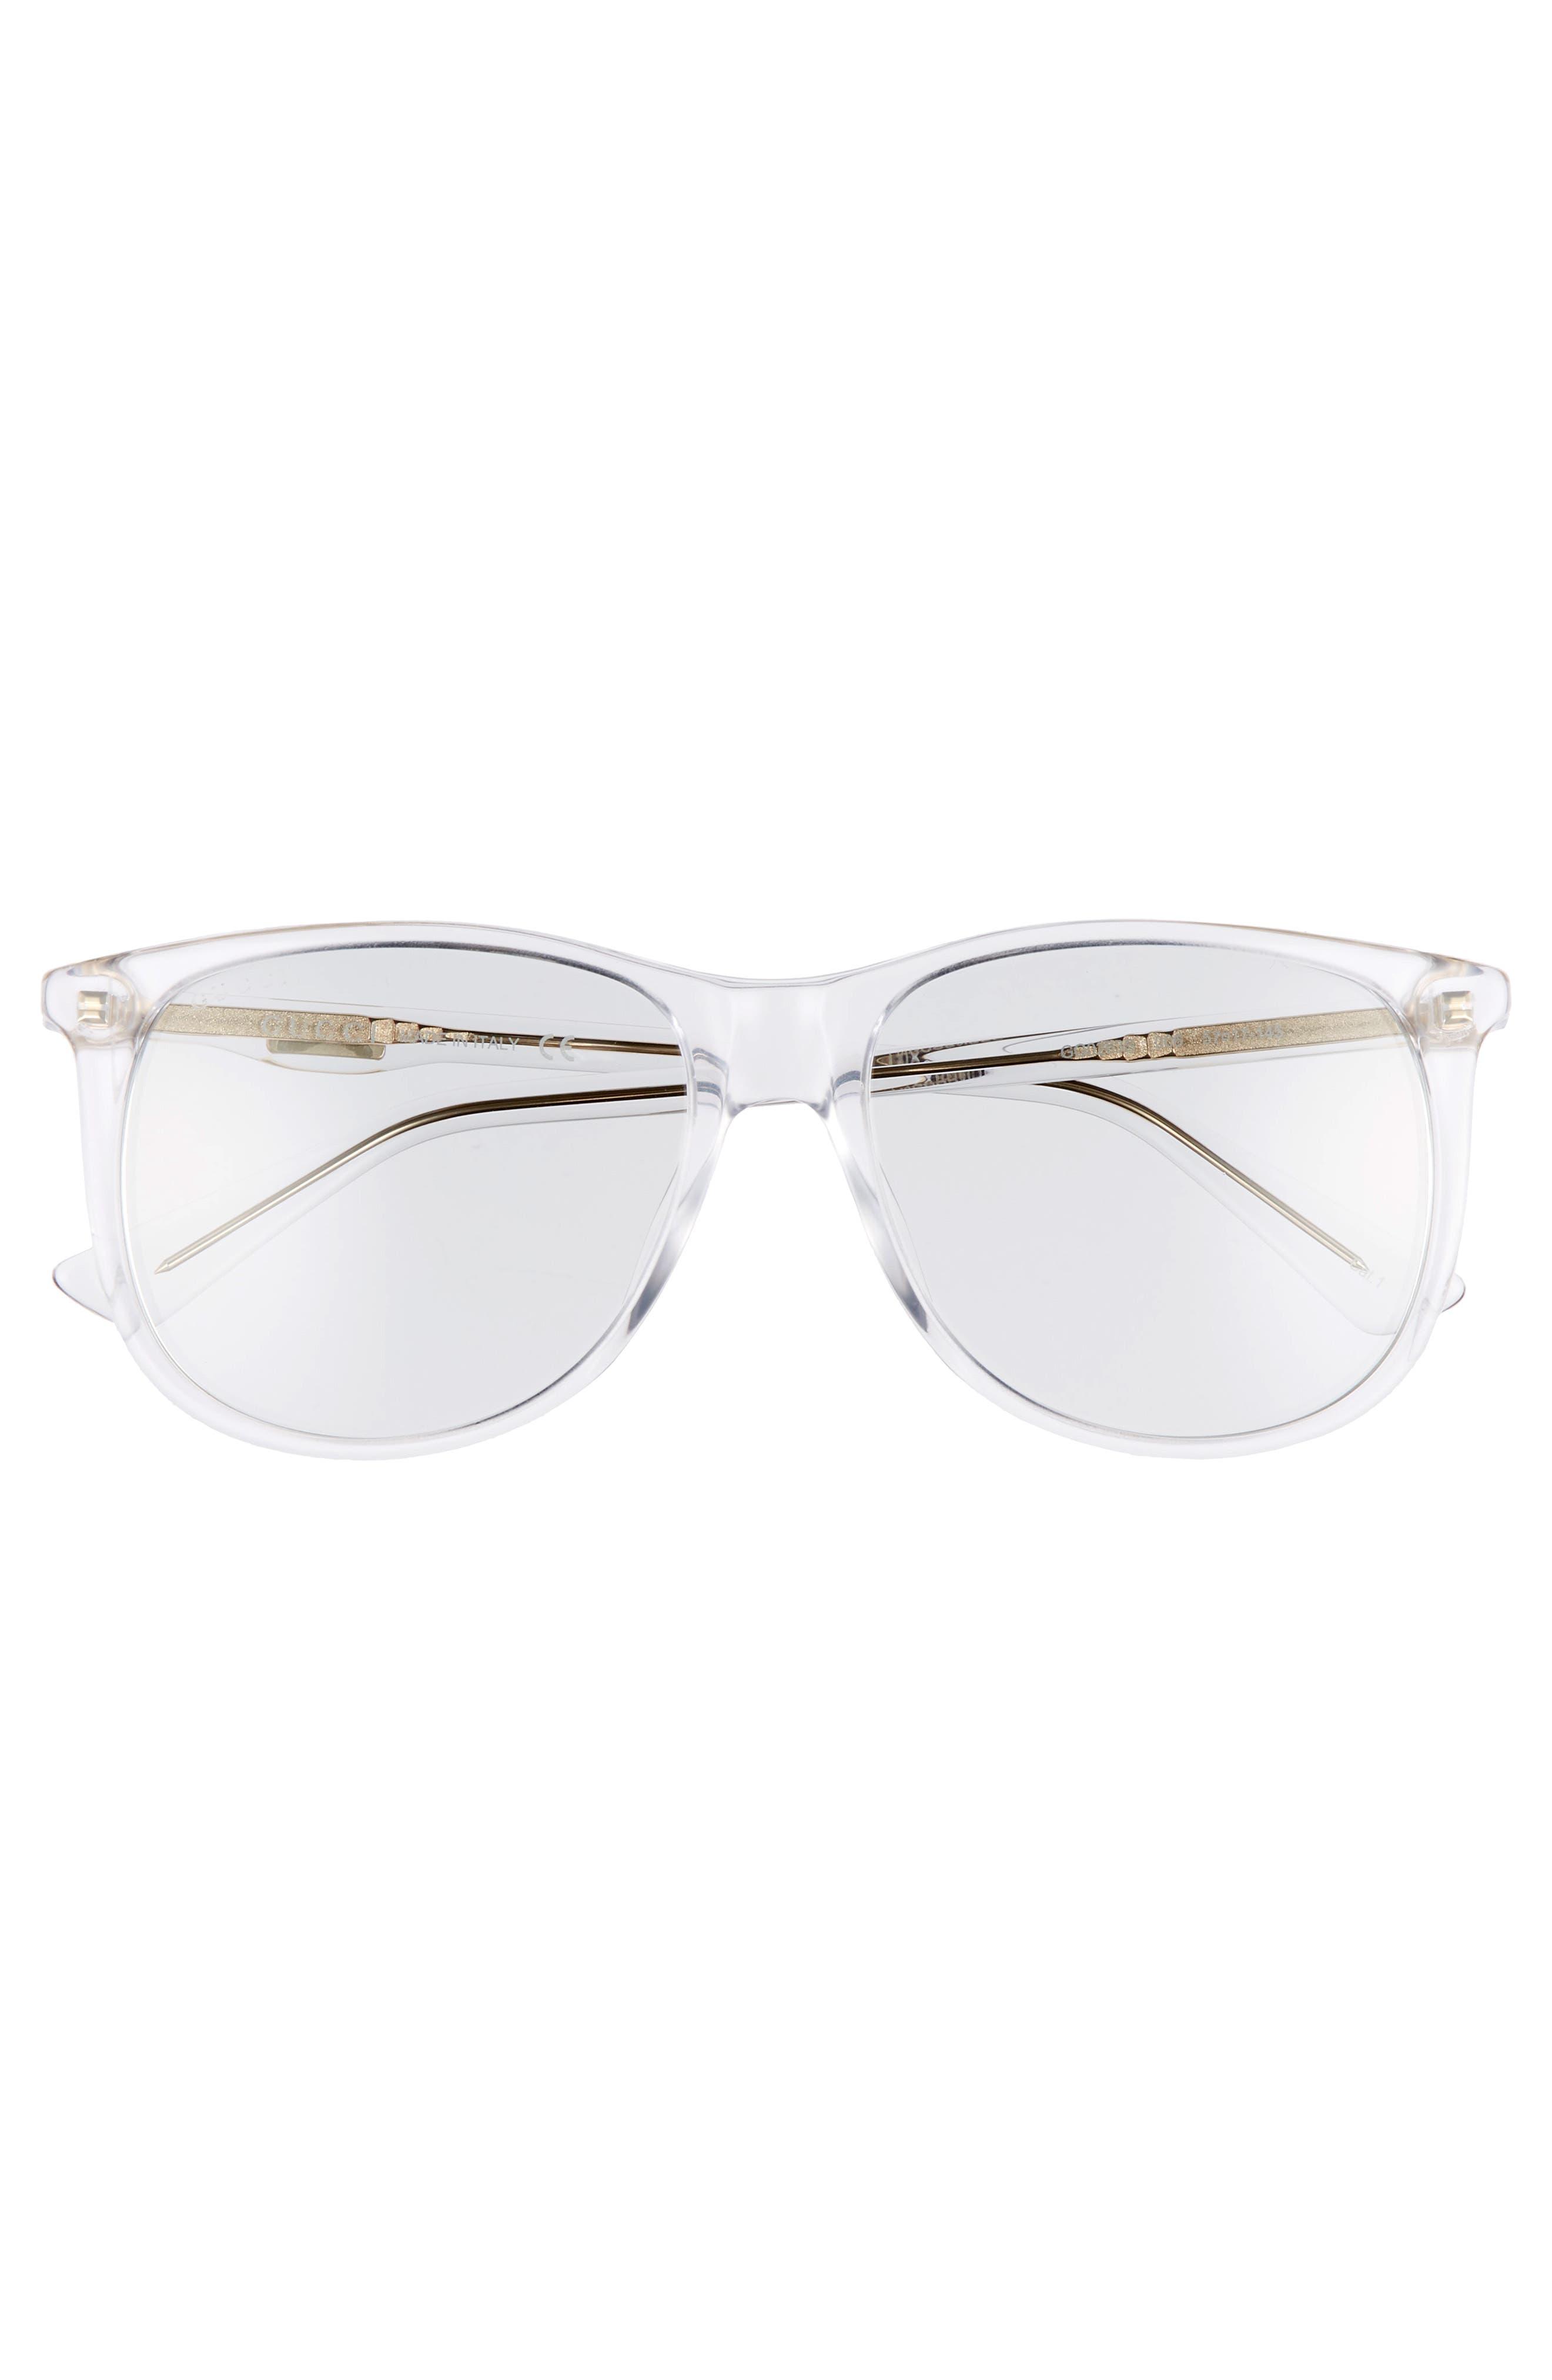 80s 56mm Sunglasses,                             Alternate thumbnail 2, color,                             Crystal